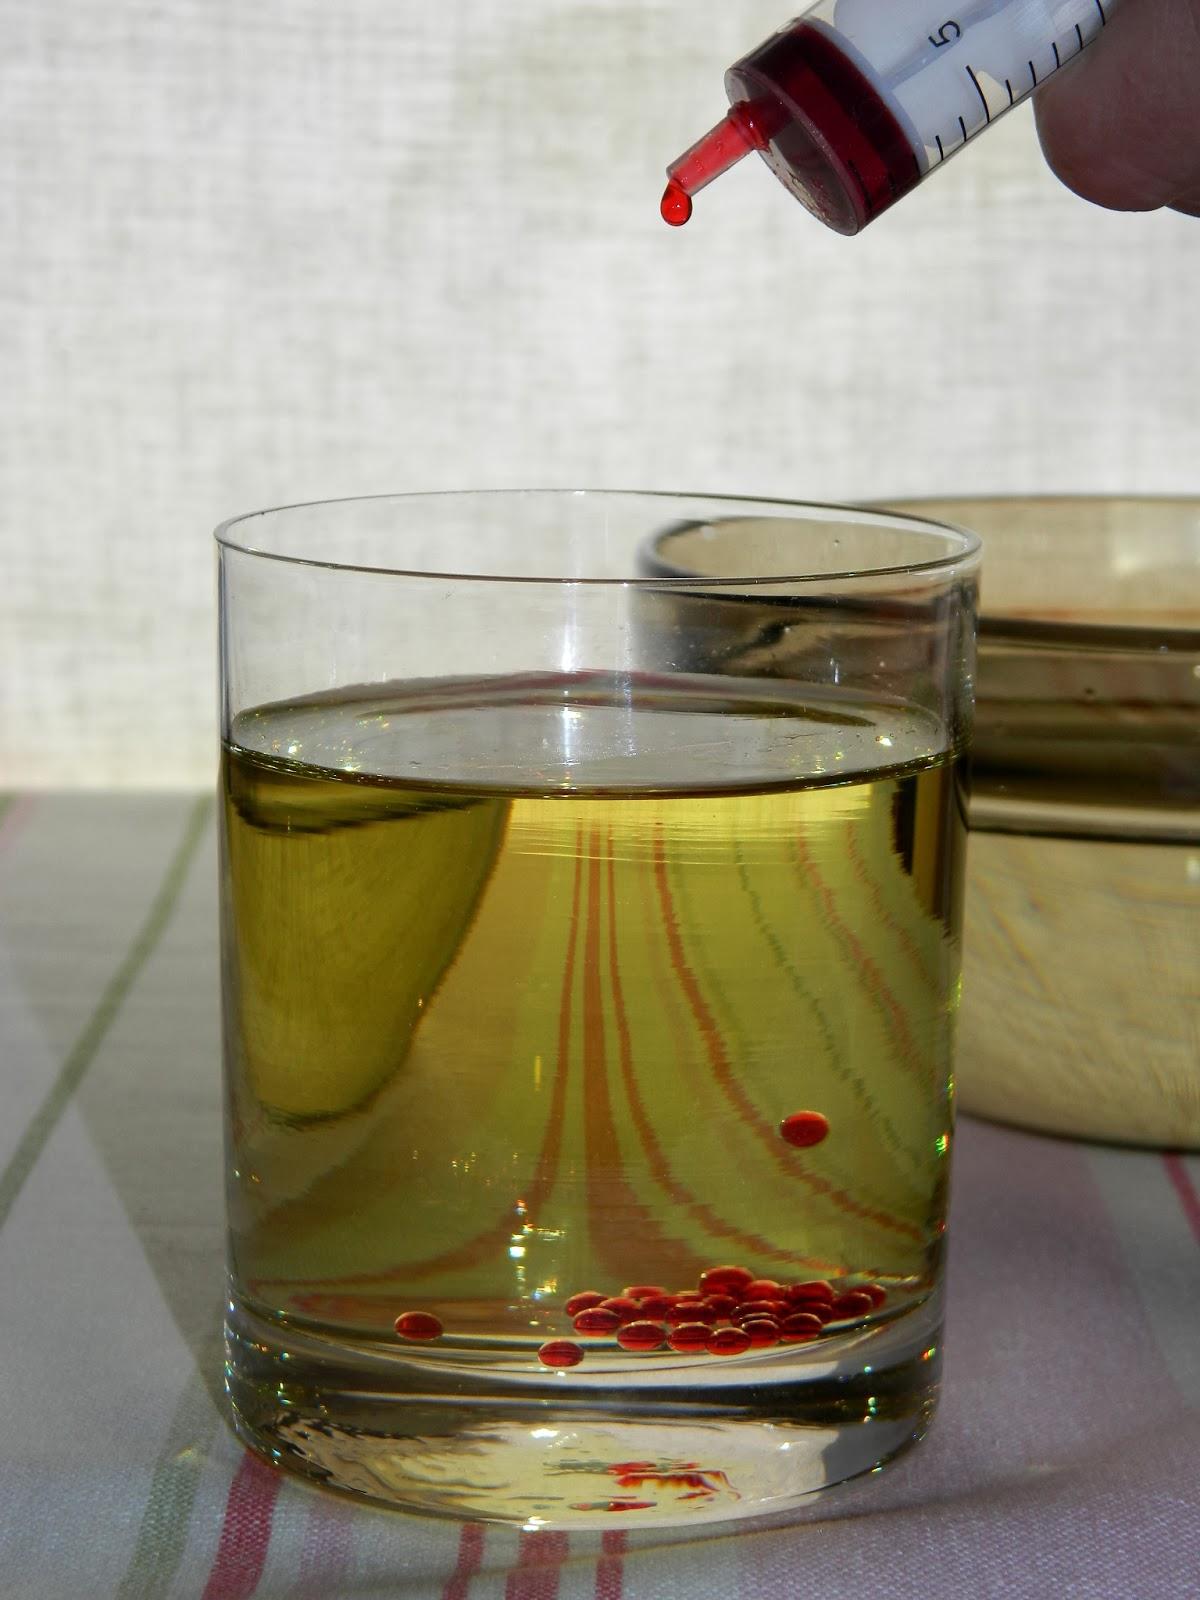 Owocowy Molekularny Kawior Limonkowy Blog Kulinarny